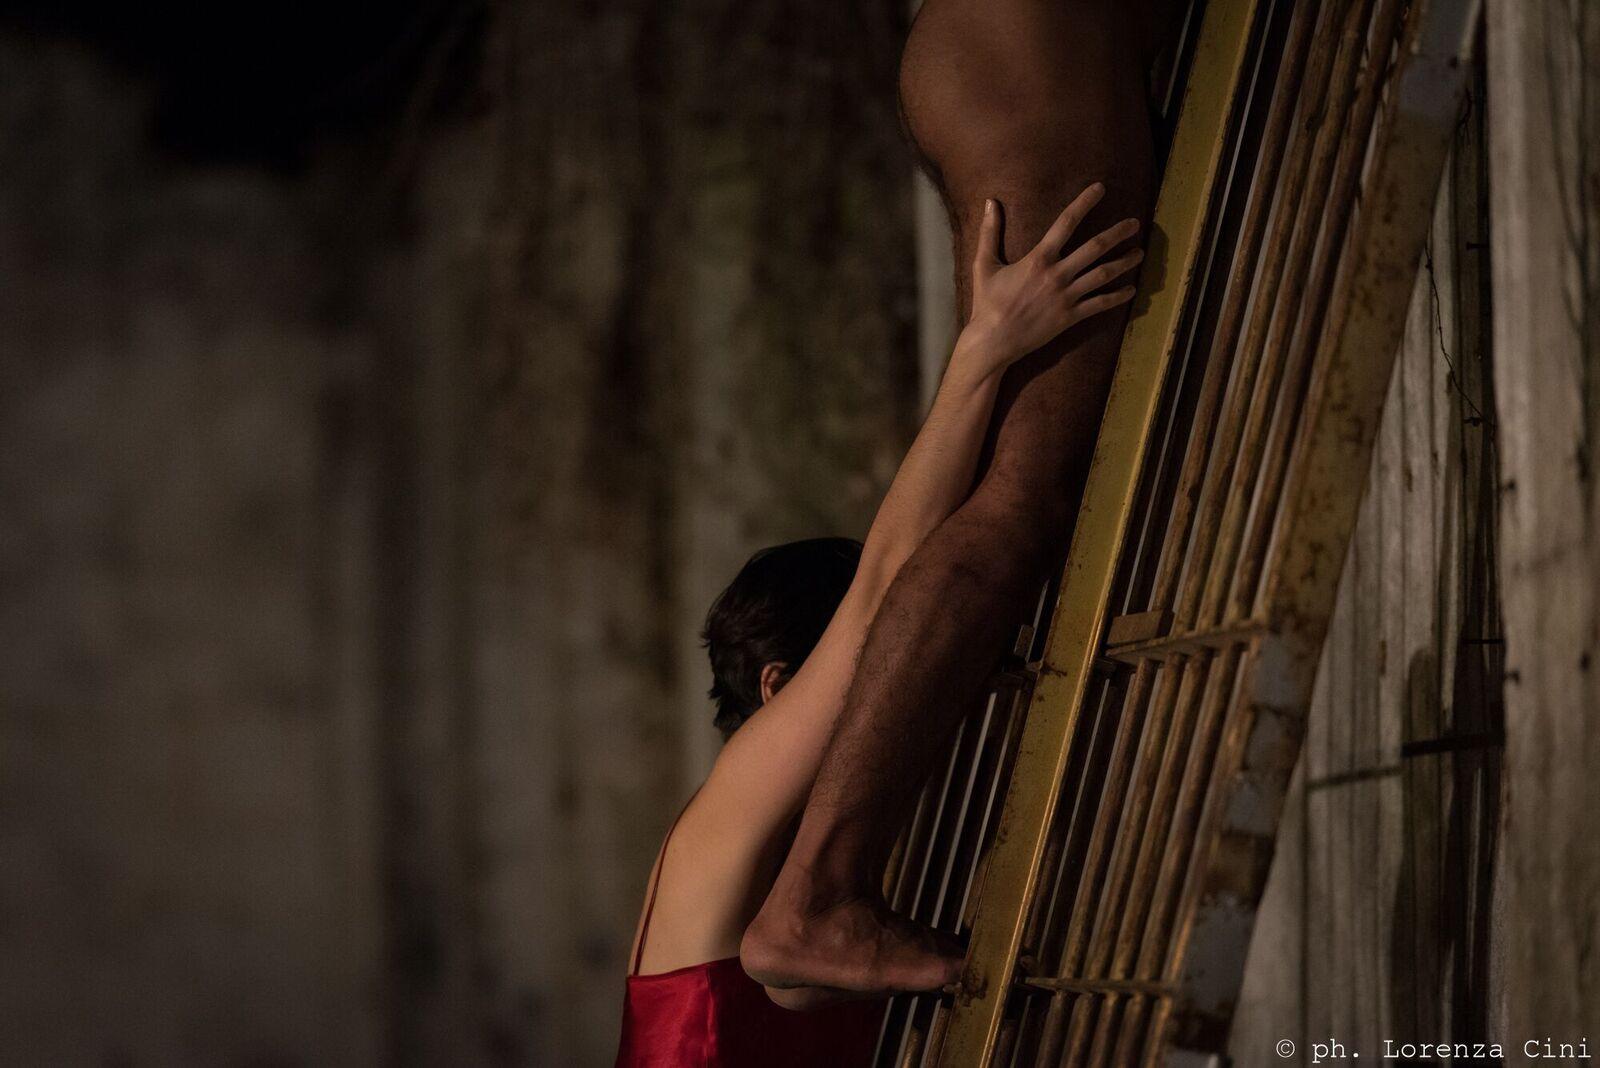 Image by Lorenza Cini